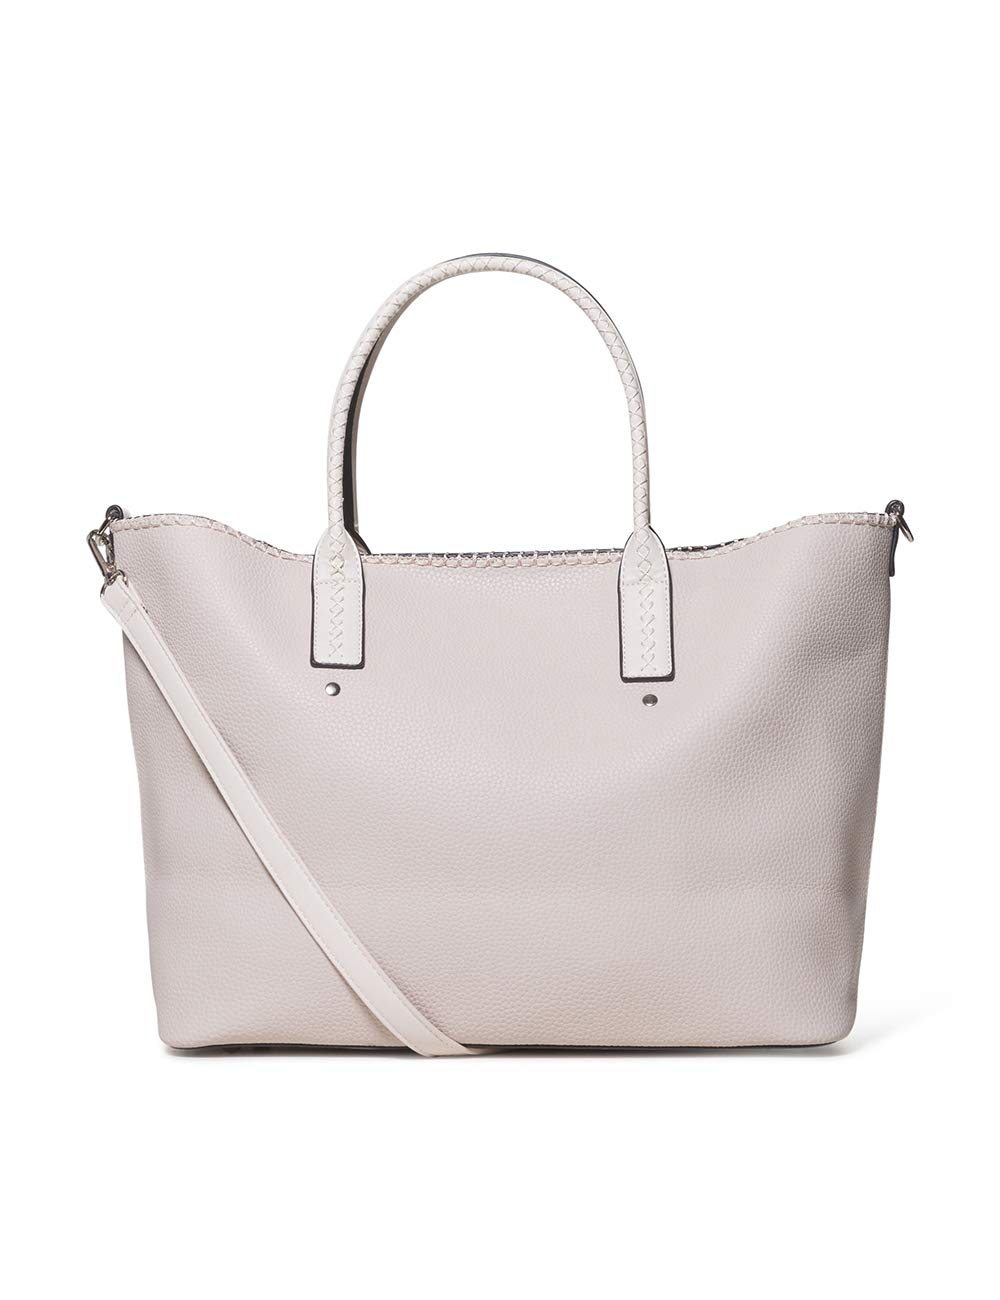 Desigual - Bag Double Gin_holbox Women, Borse a spalla Donna 2 spesavip